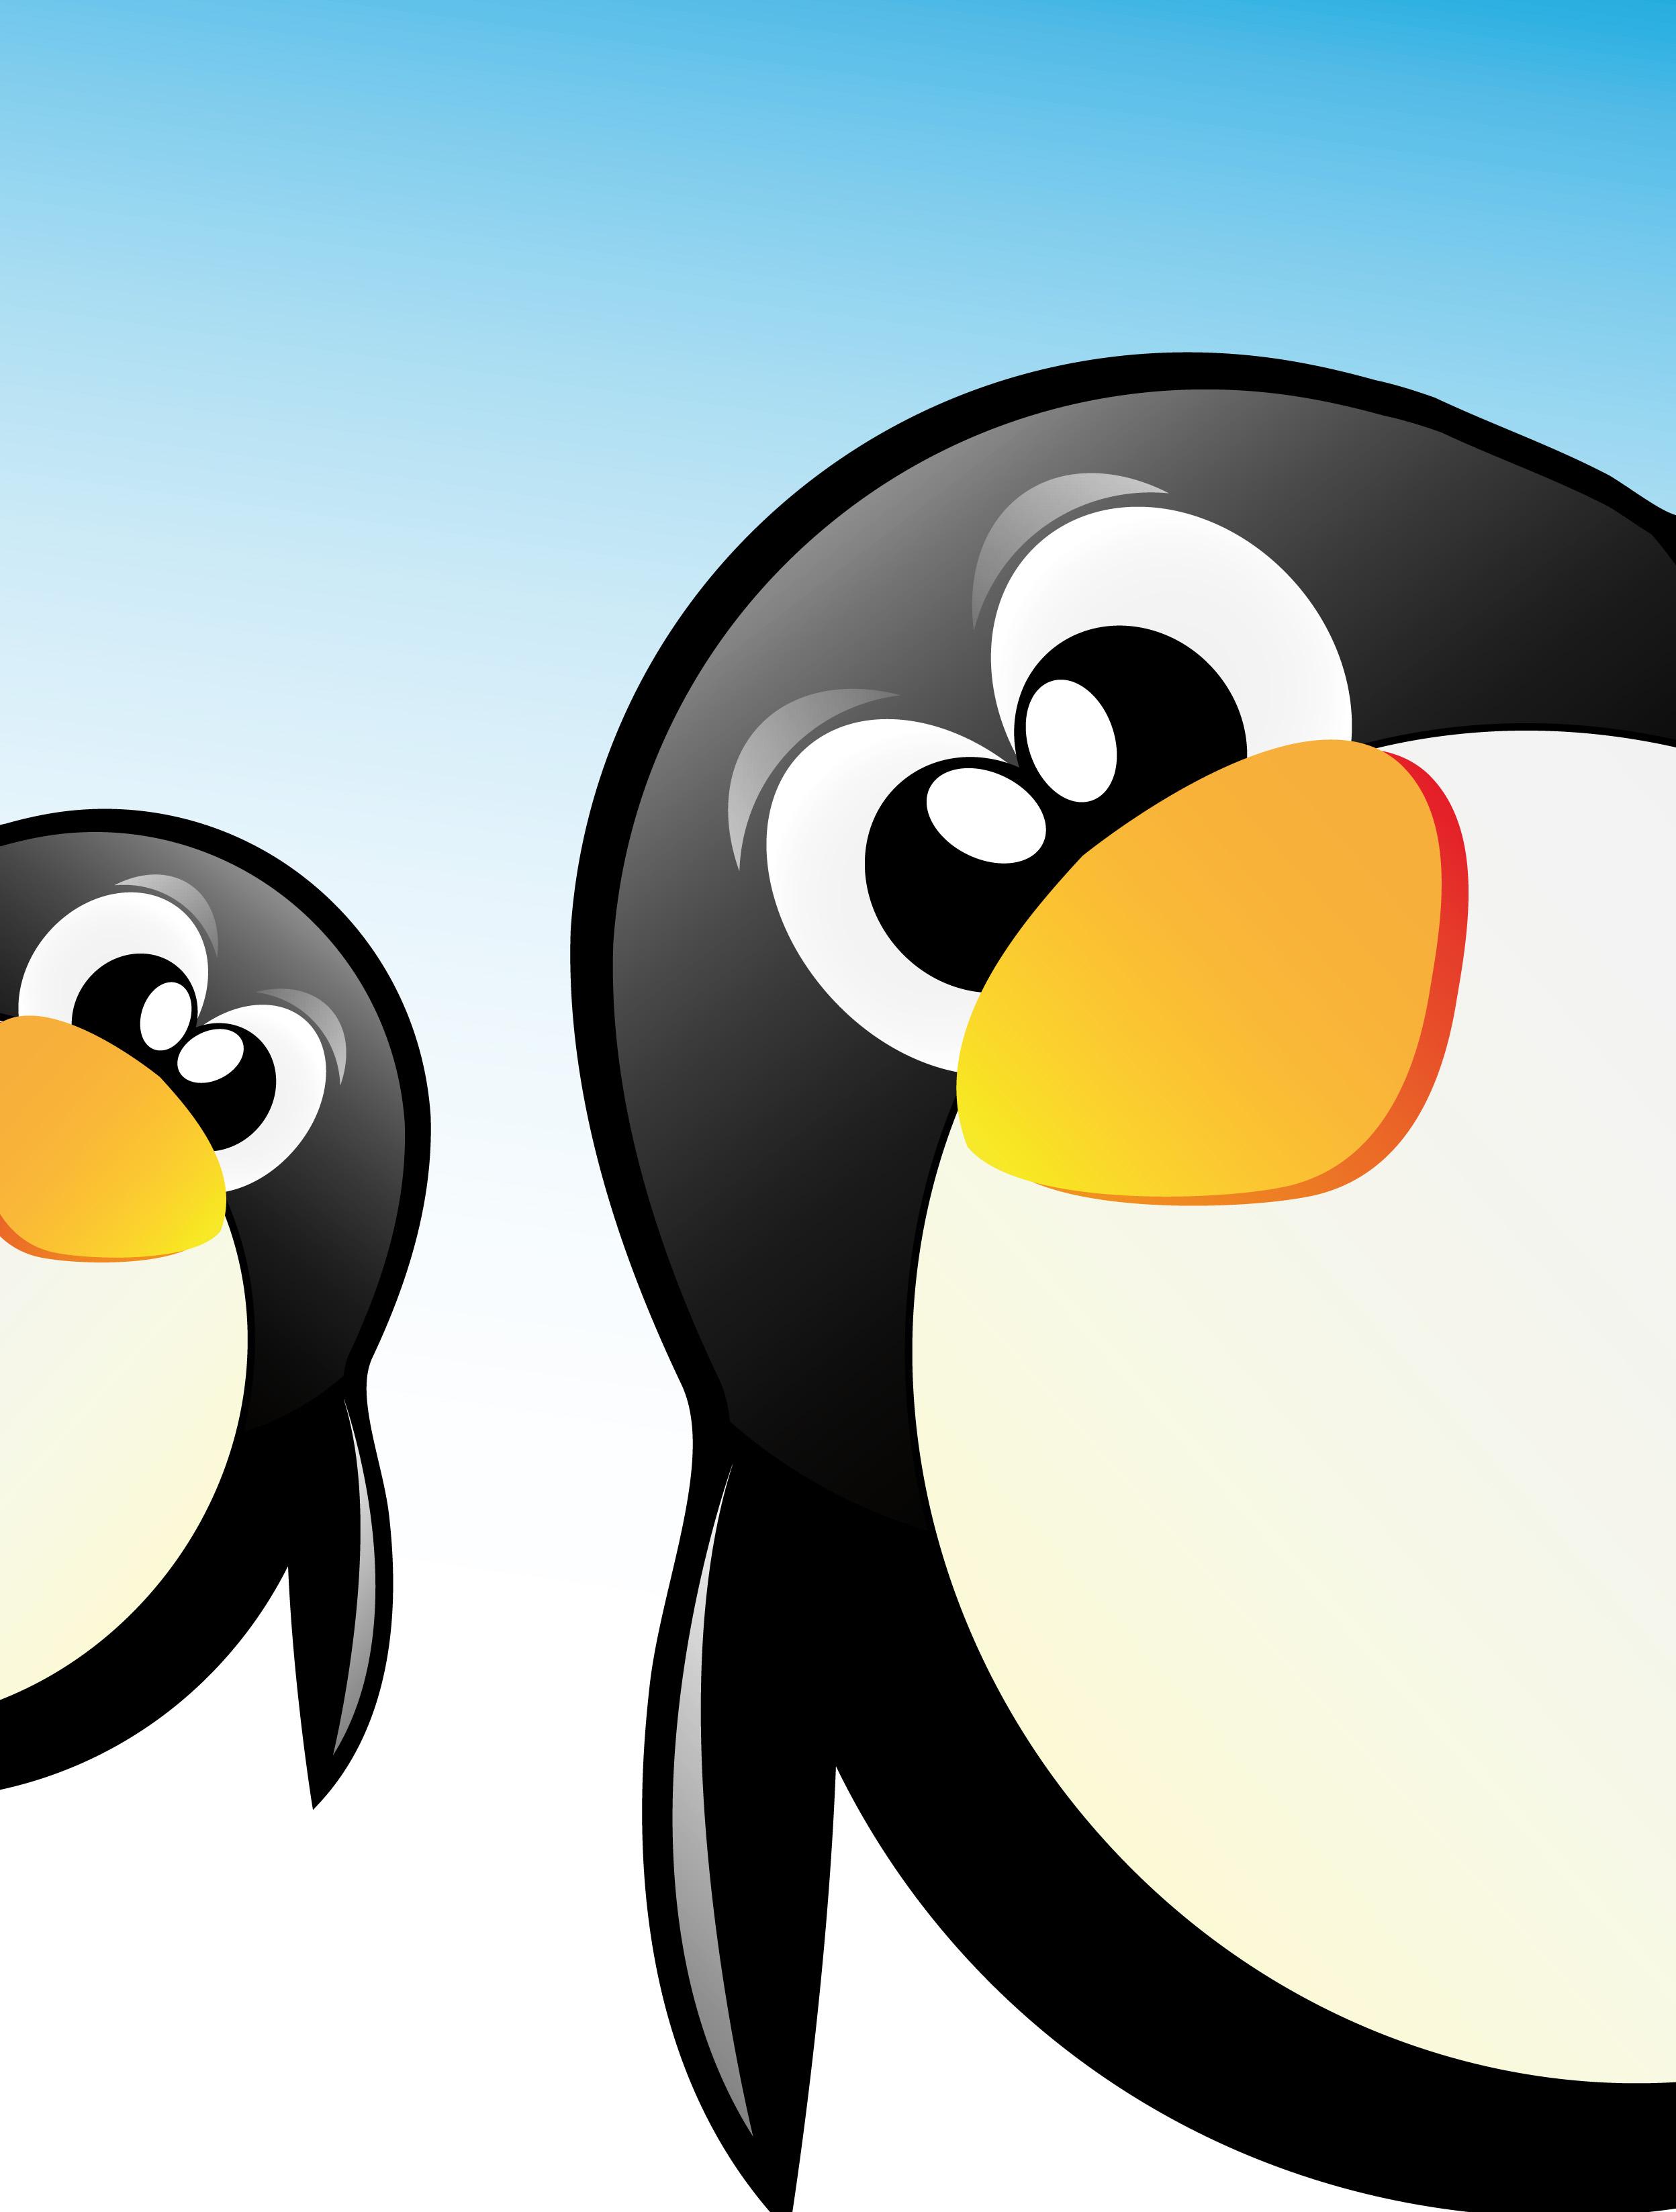 Funny penguins design elements vector 05 - Vector Animal free download